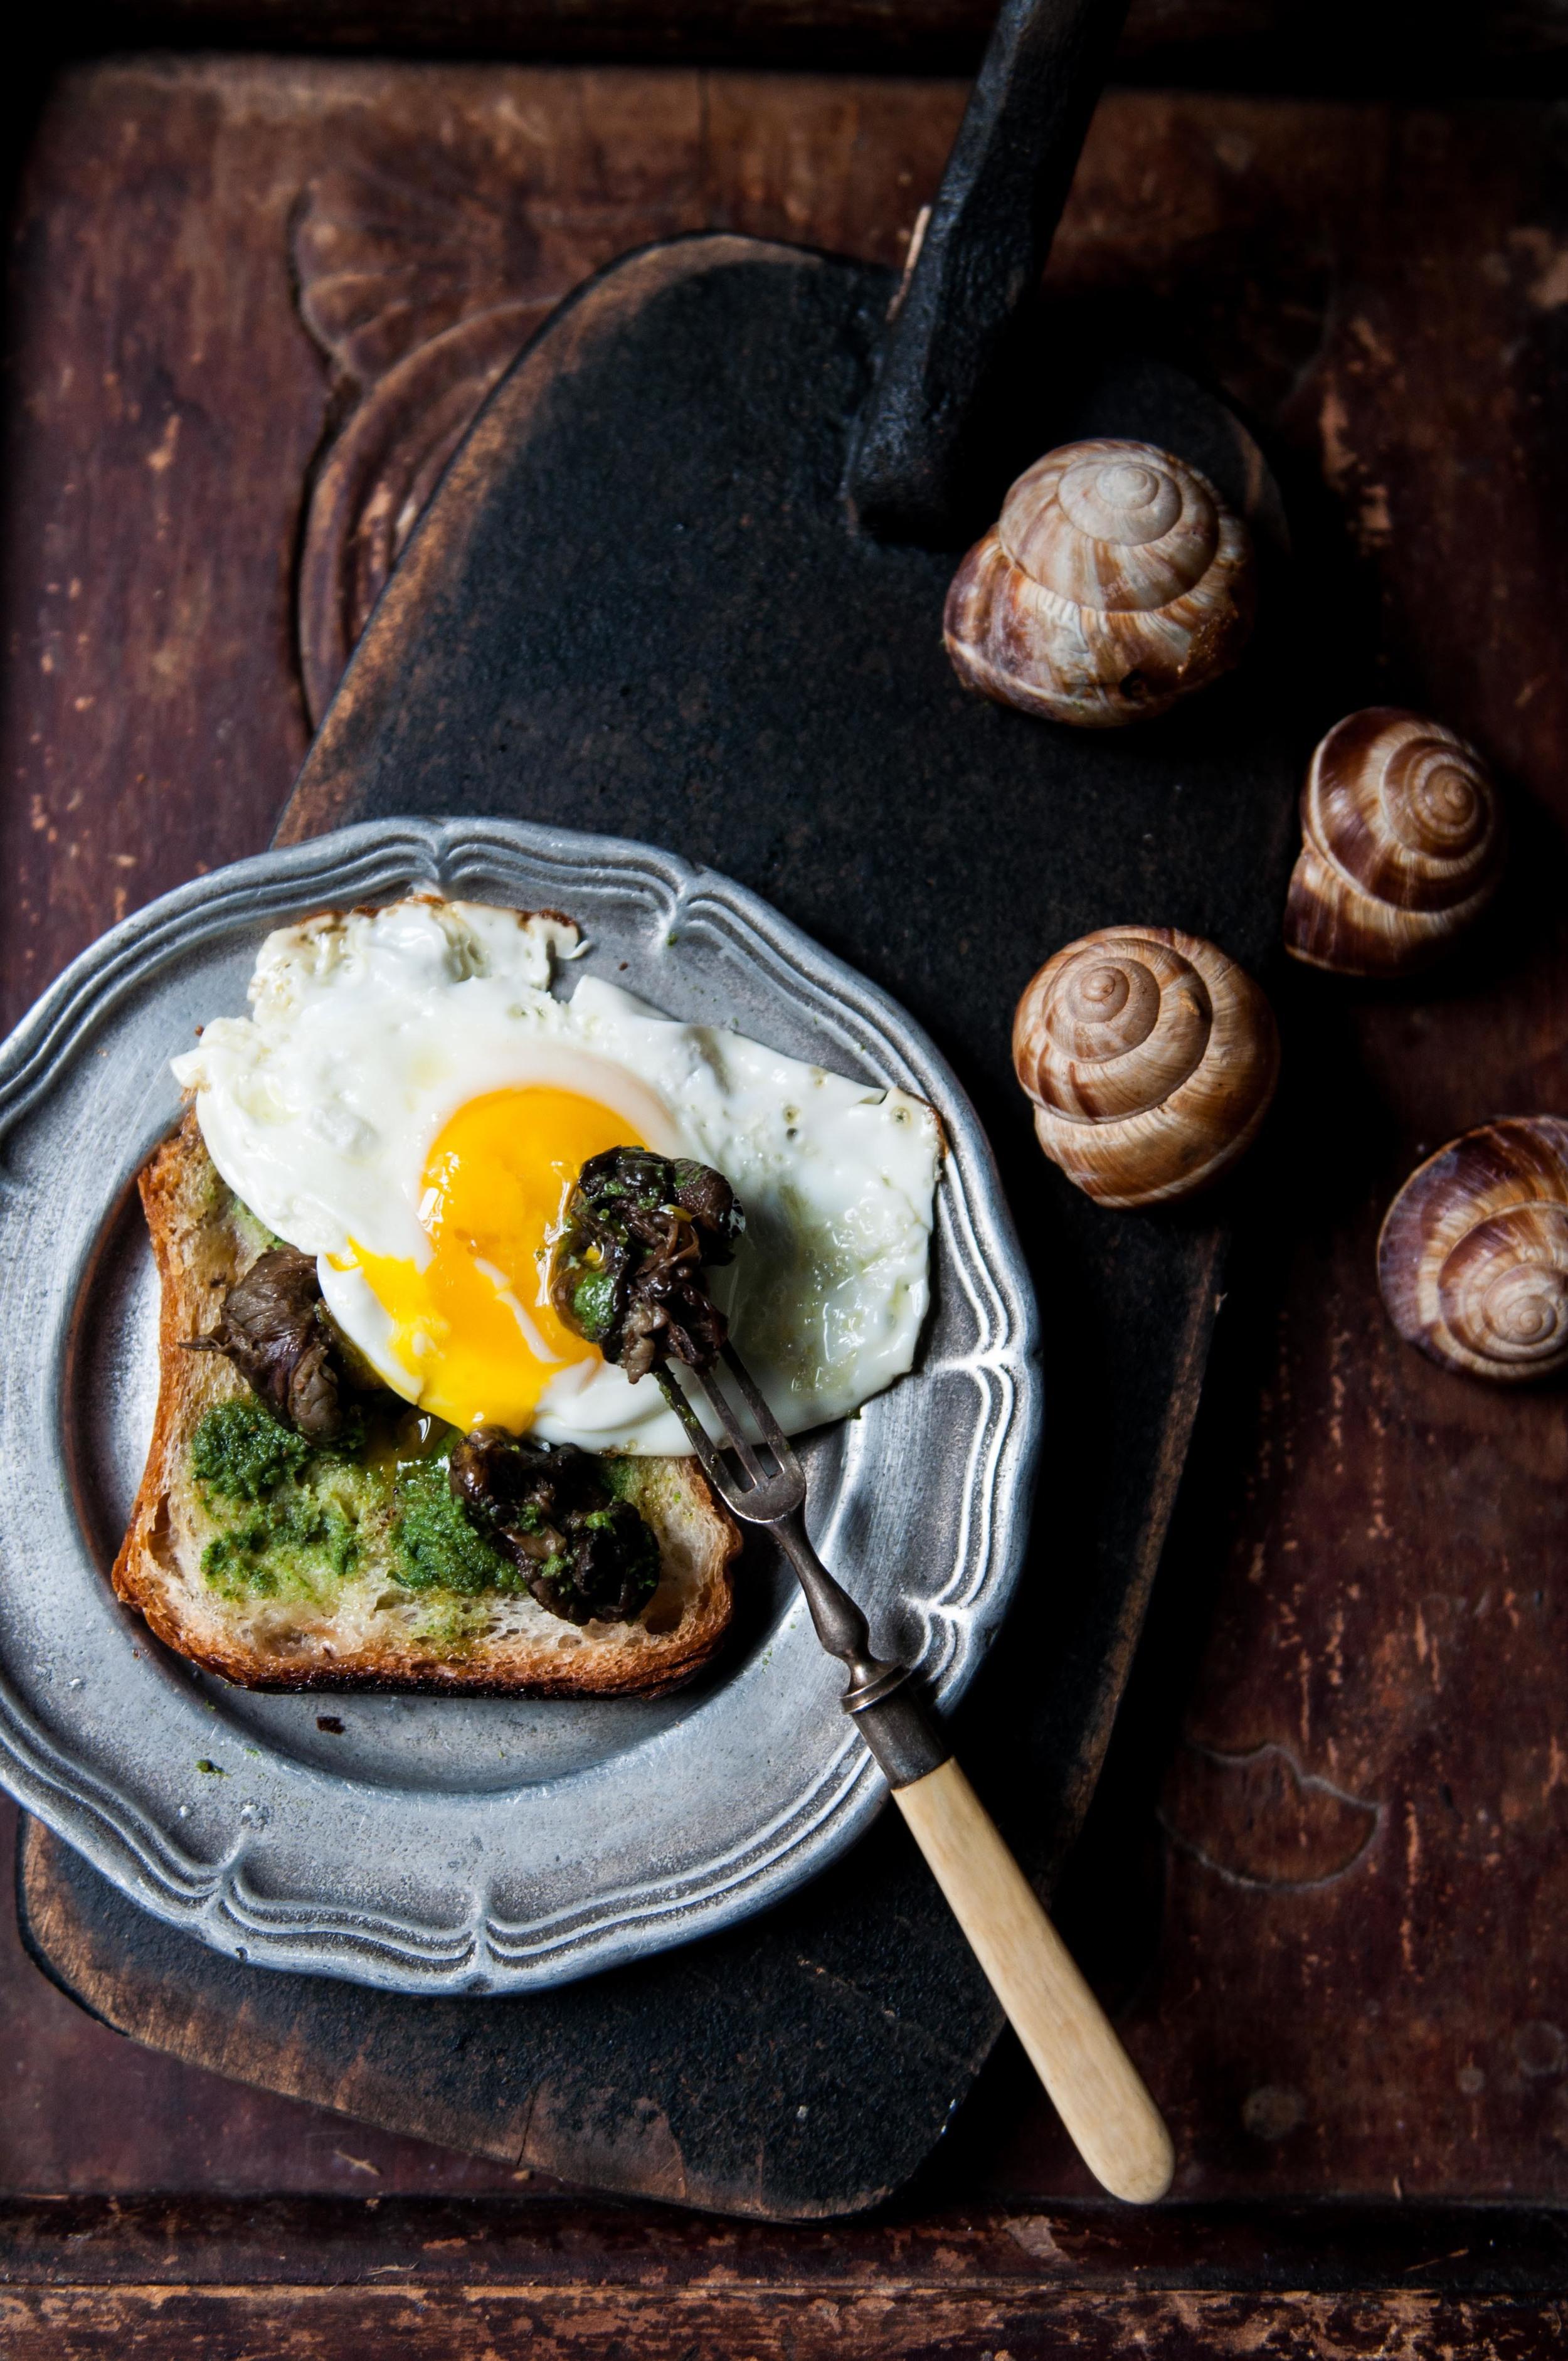 Escargots on Toast + Dipped in Fried Egg Yolk #PutAnEggOnIt